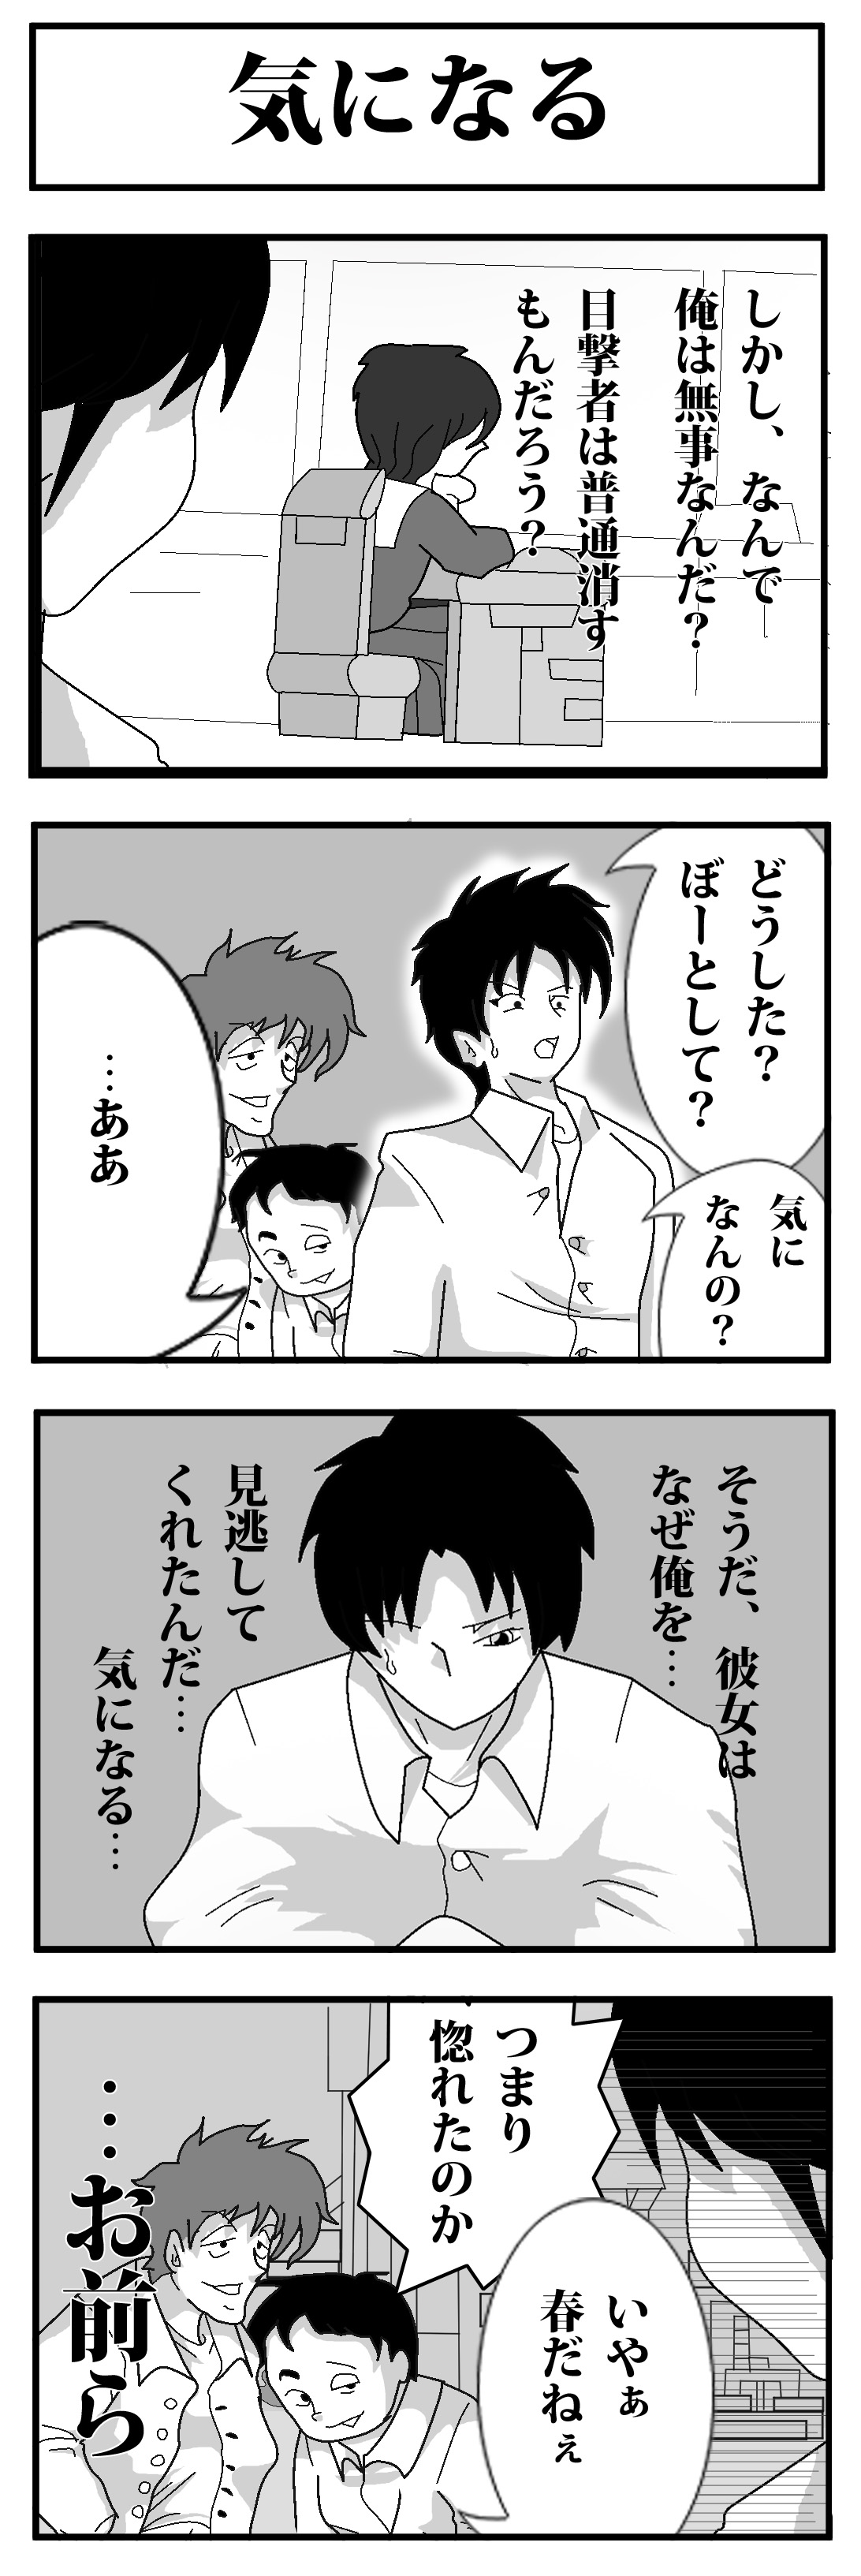 BokusatuA01-053.jpg